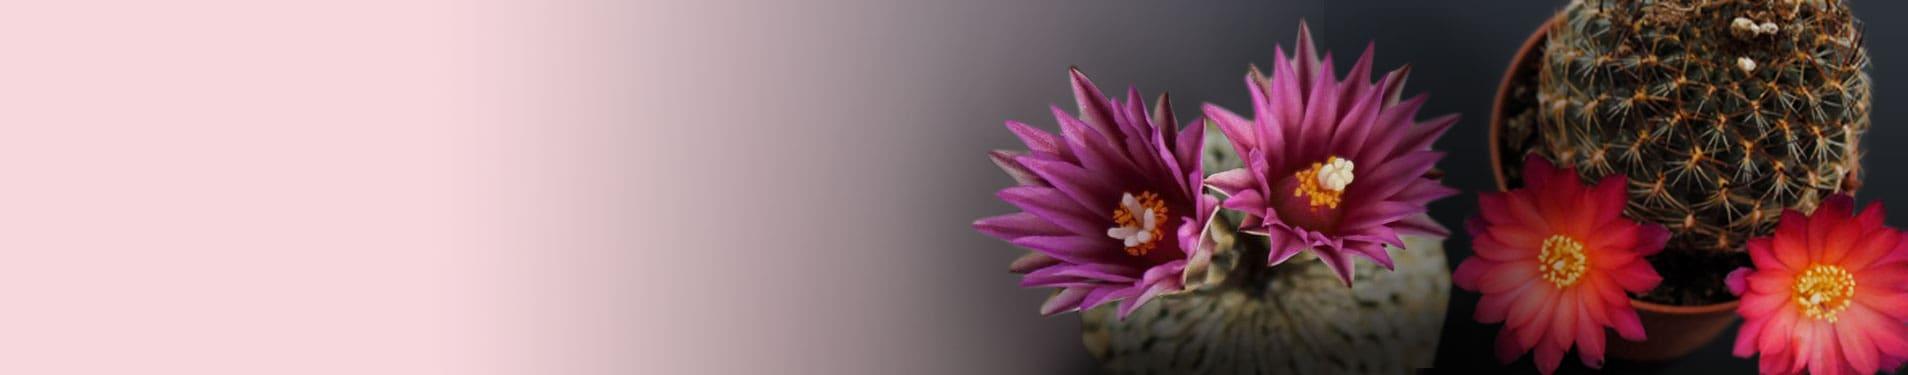 Cactus con flores online